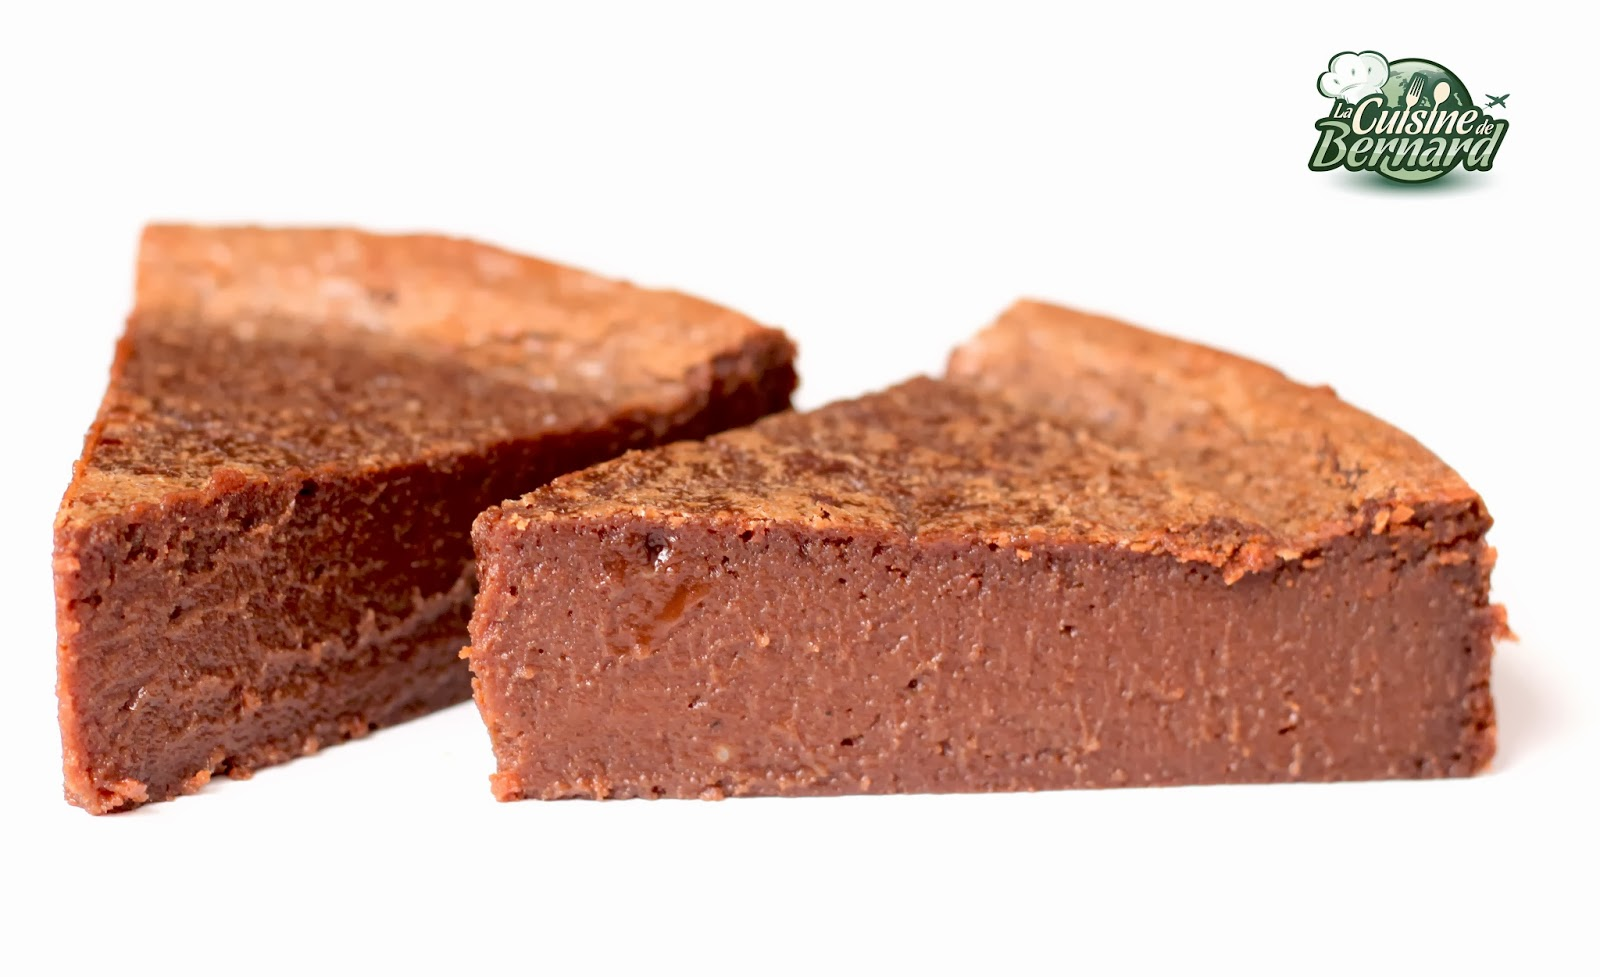 Fondant Ultra Au Chocolat Et Crème De Marrons La Cuisine De Bernard